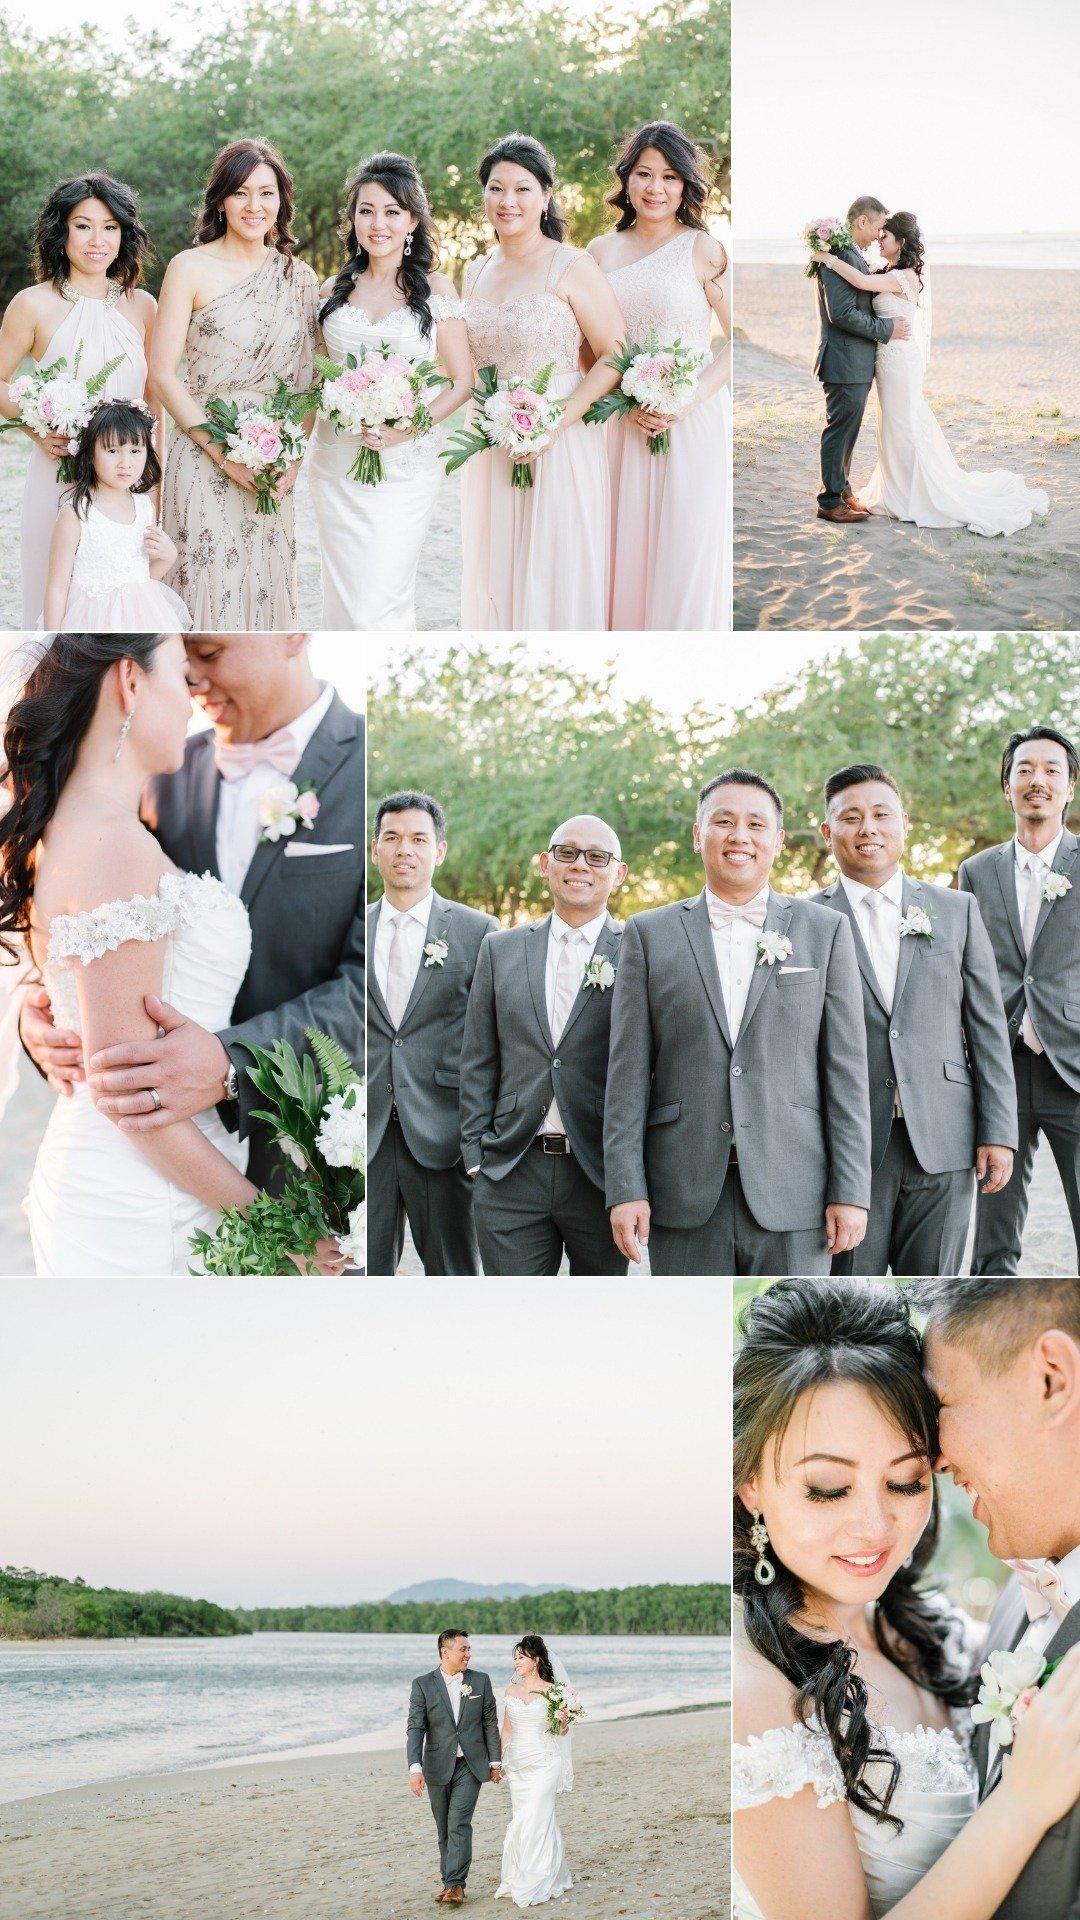 wedding party groomsmen in grey bridesmaid in blush